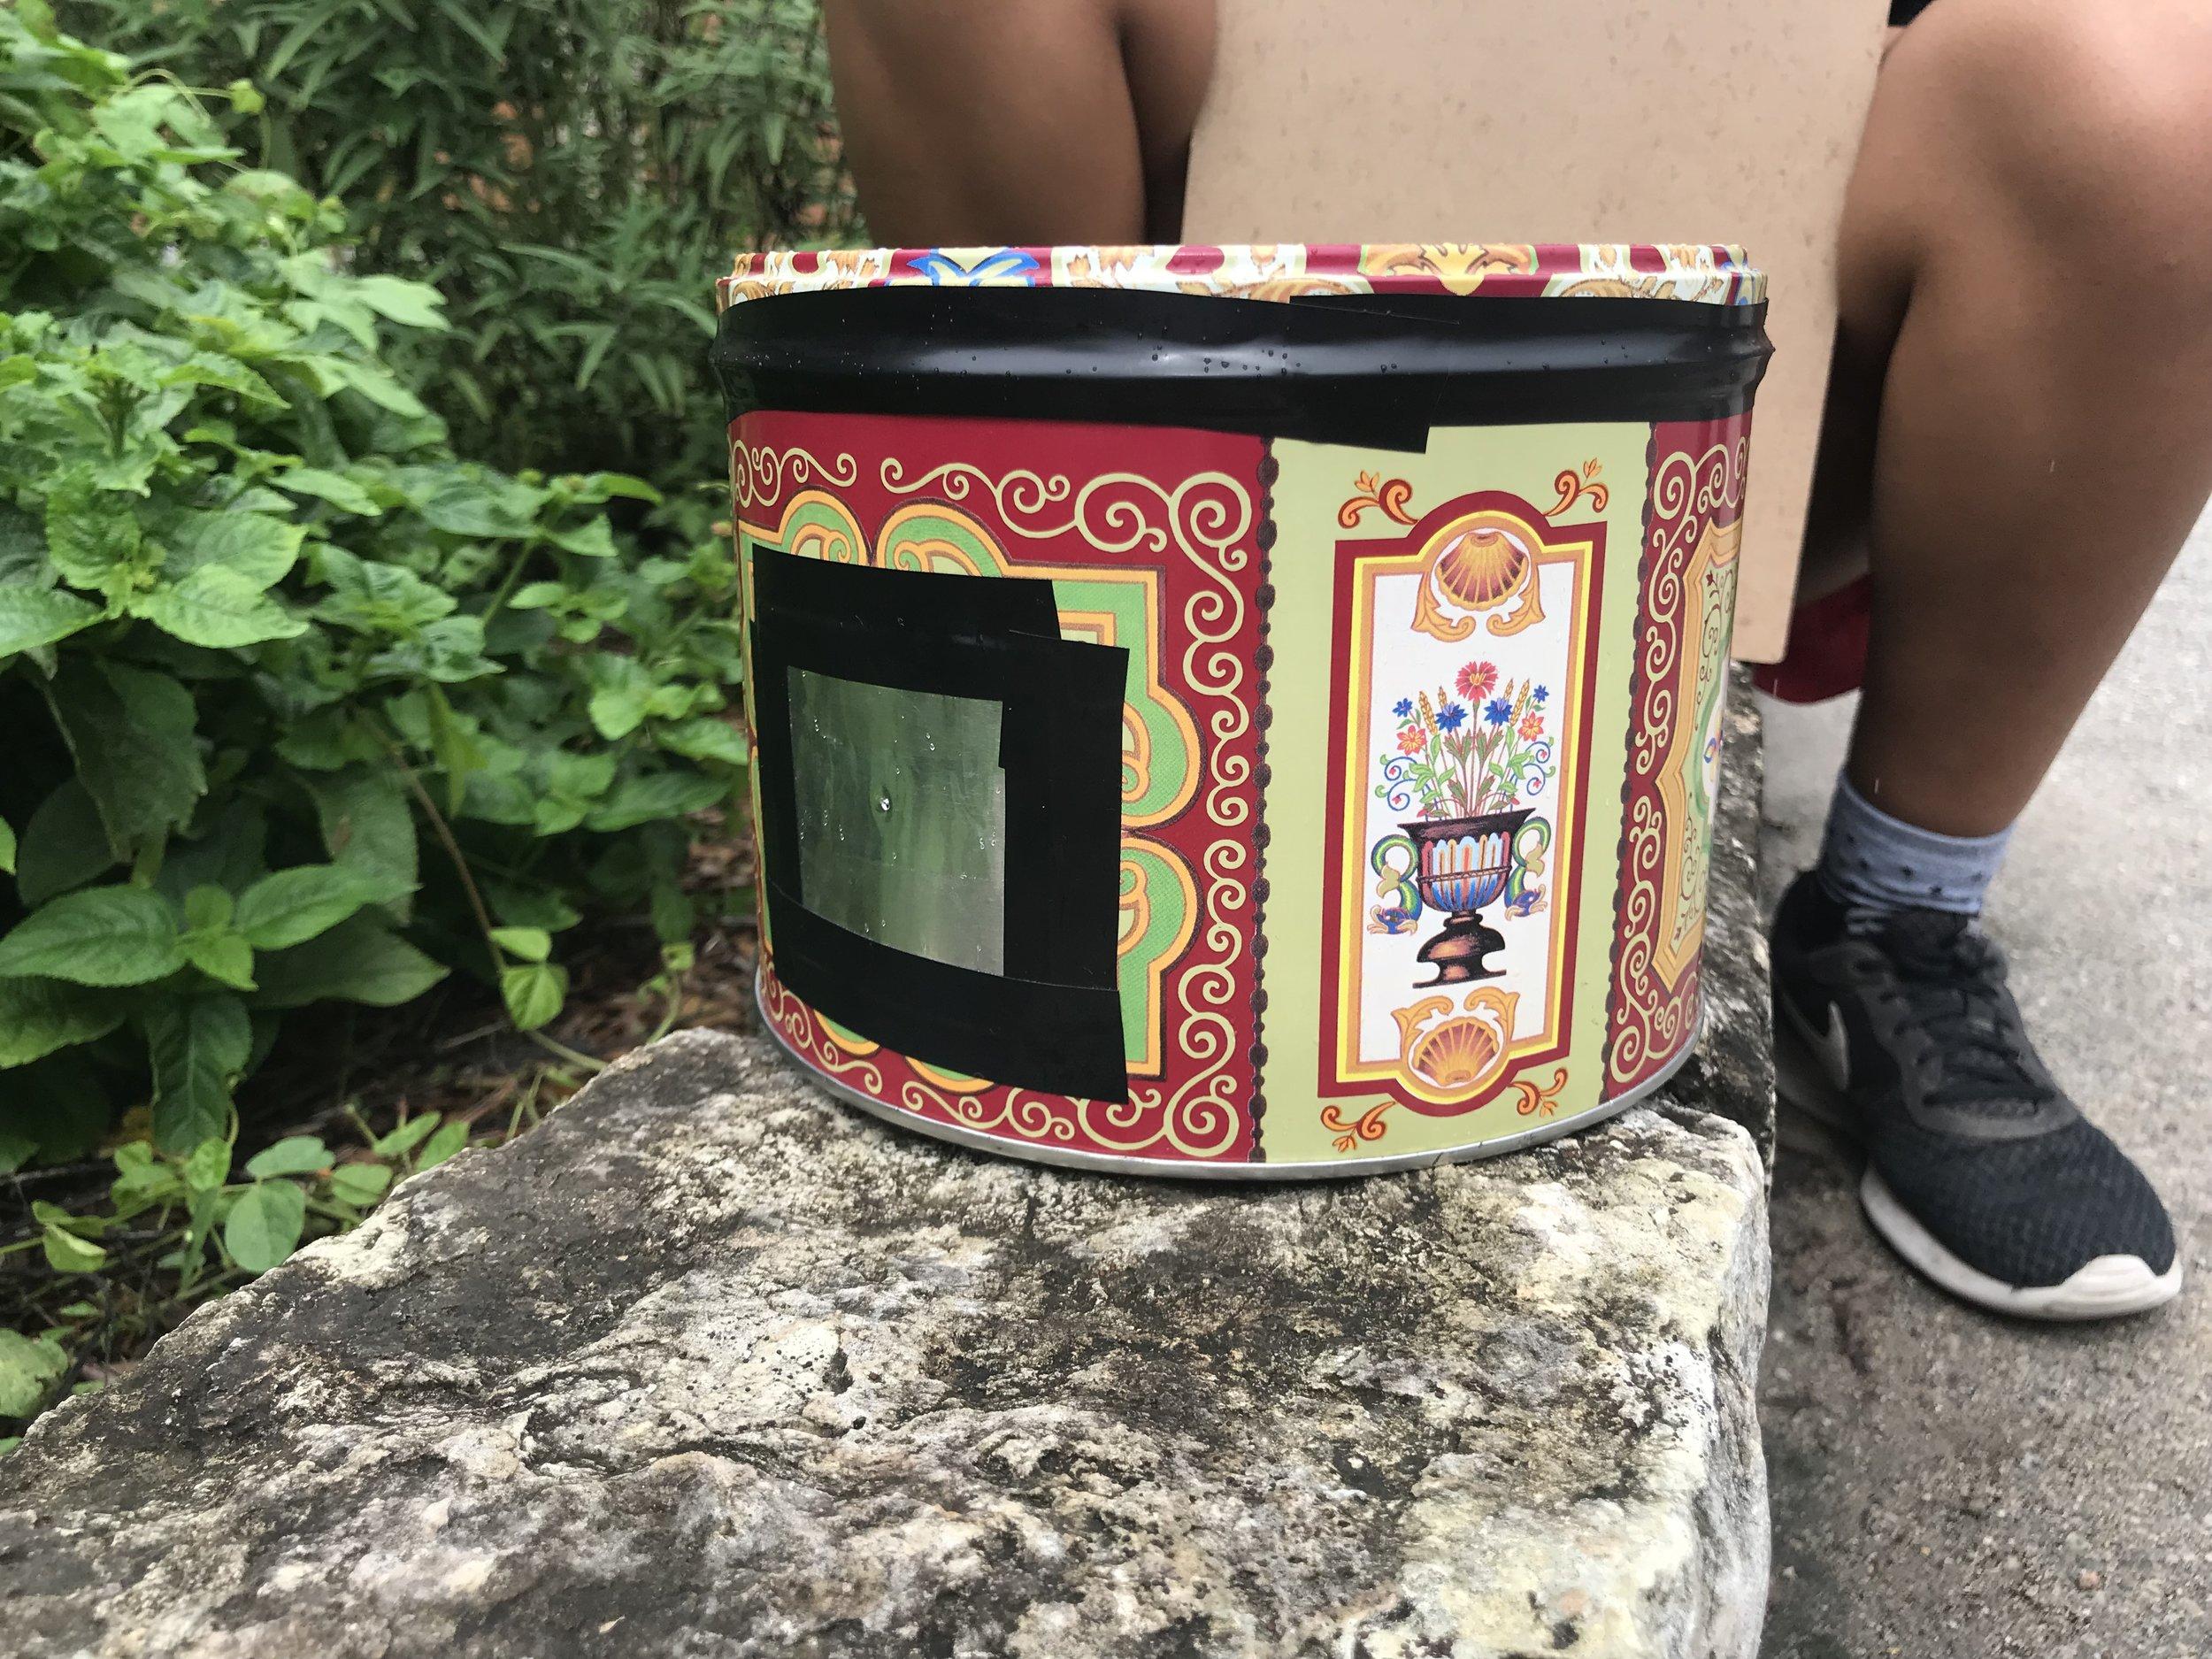 2018-09-14-pinhole-camera-made-by-maya-hyder.JPG